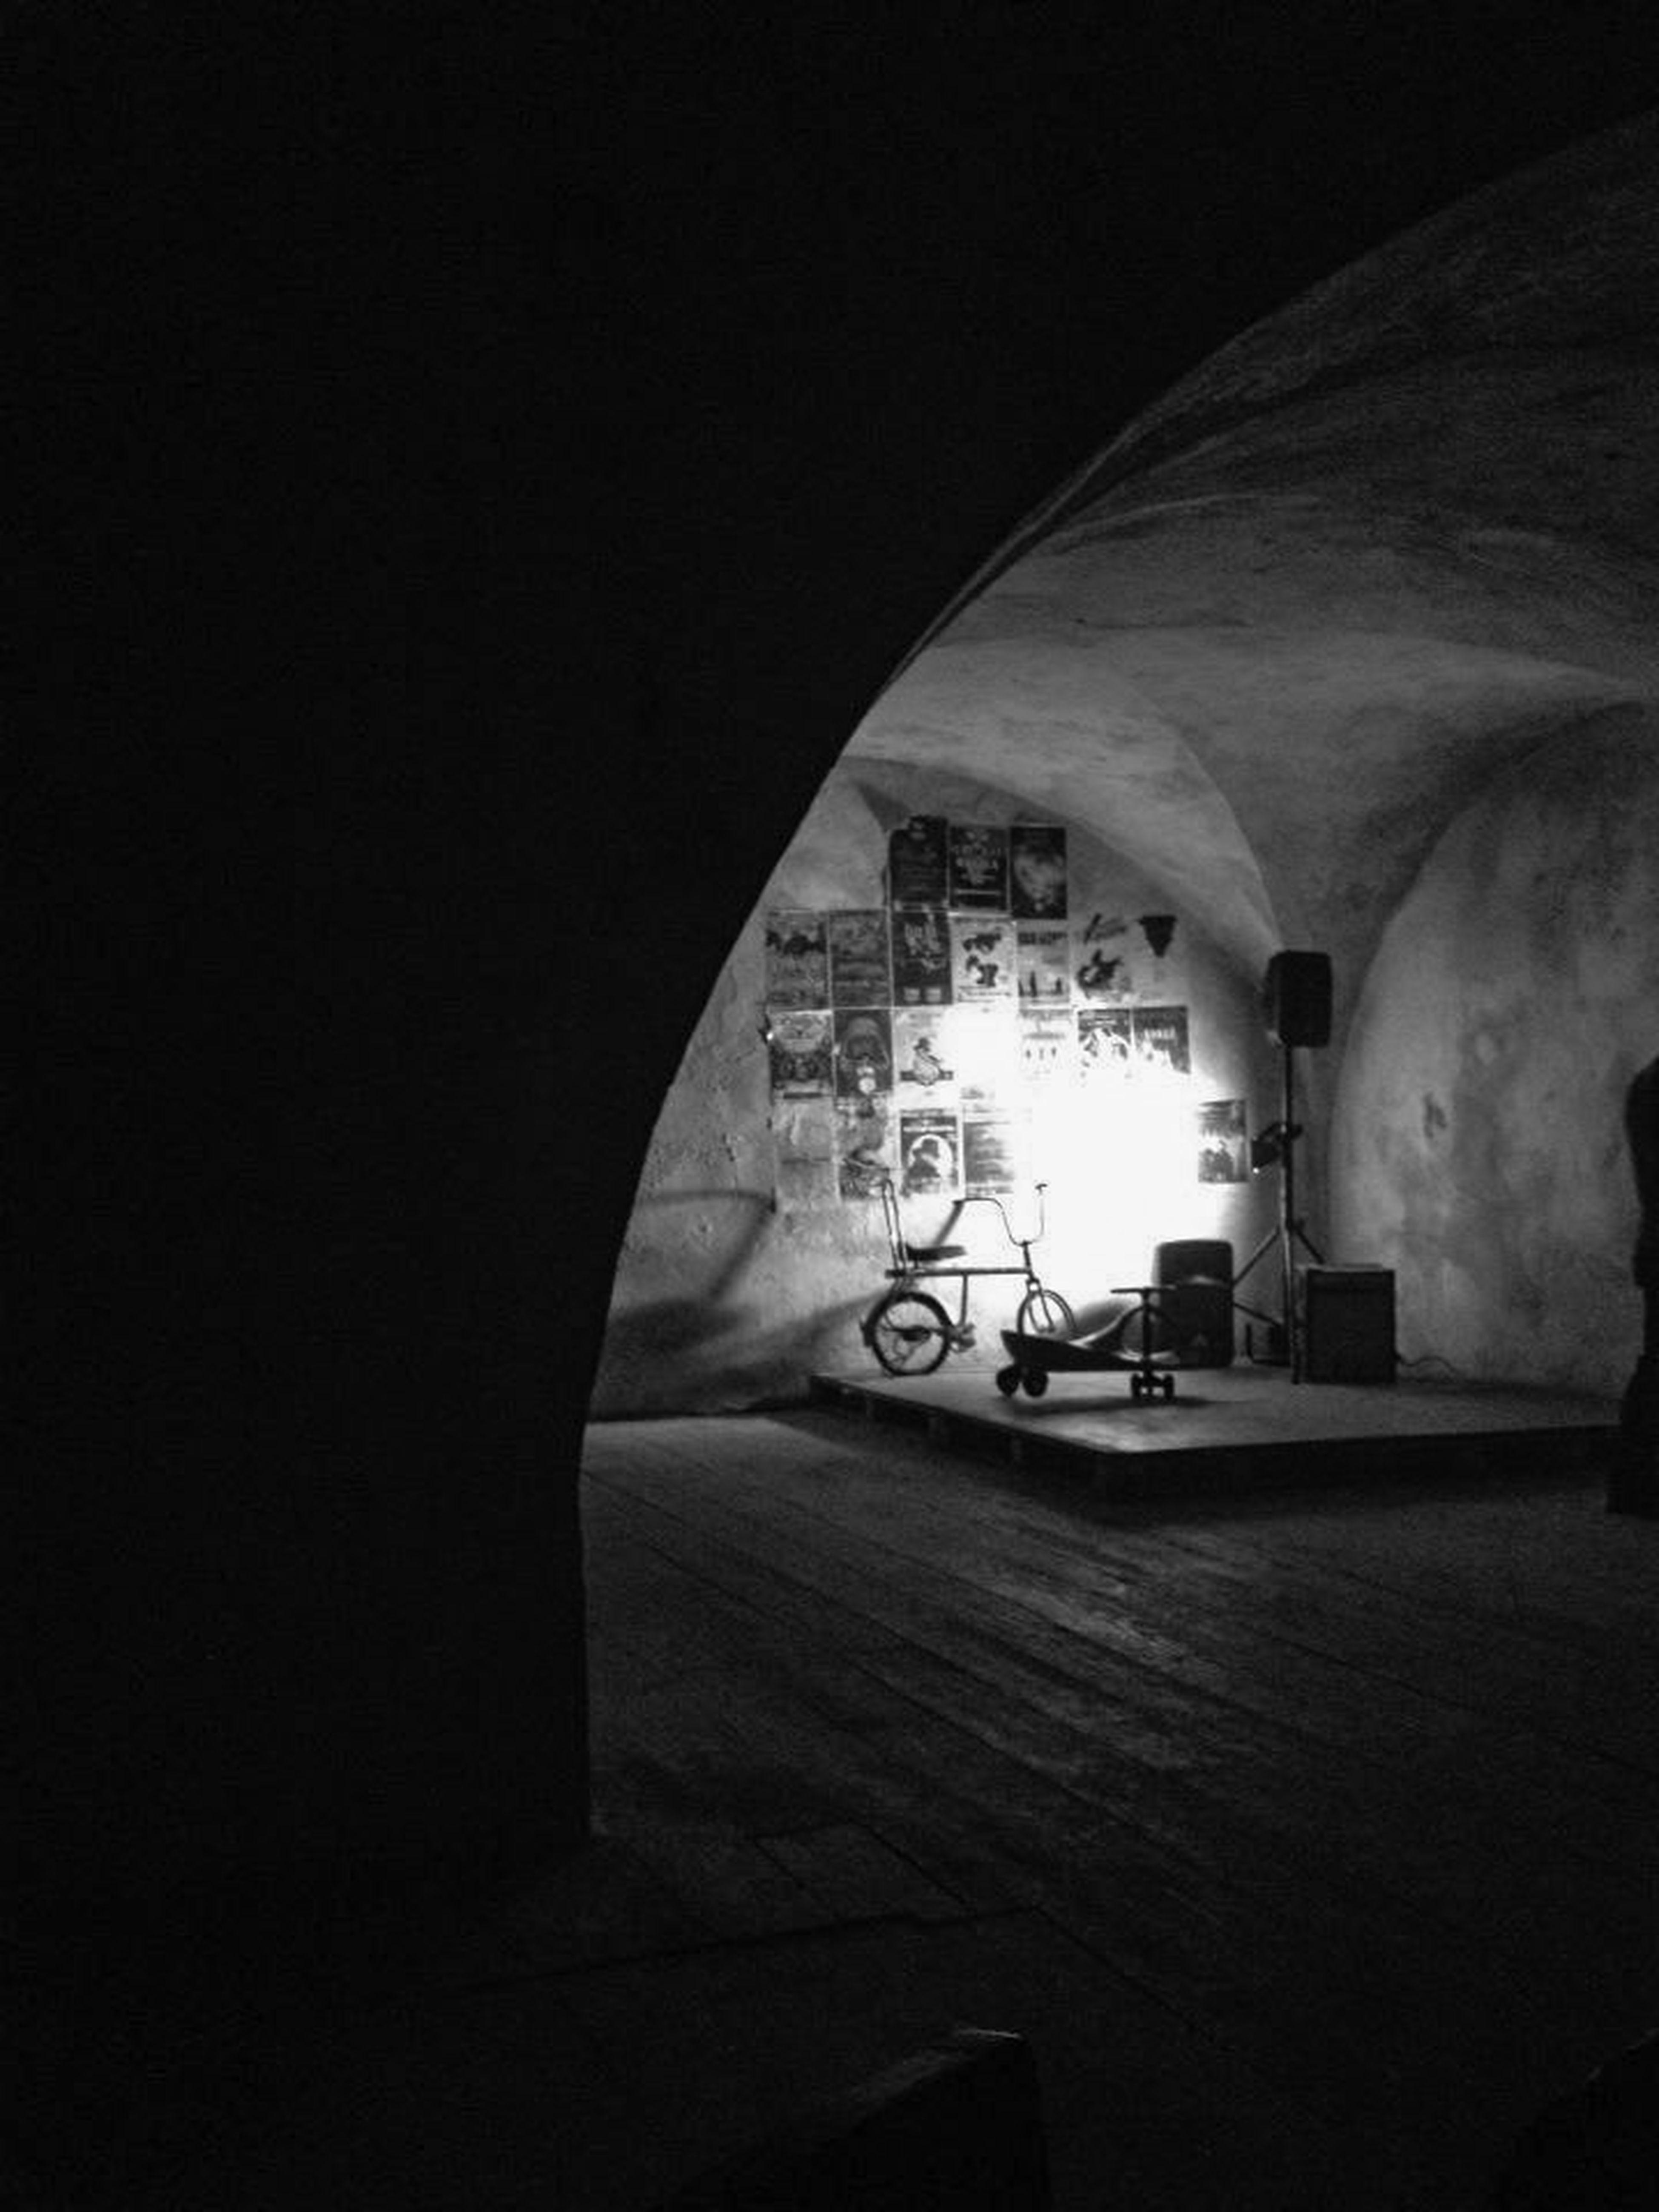 The deceased Fantasma, lisbon. Taking Photos Geometric Shapes Relaxing Saudade Musicforbrain EyeEm Best Shots Lisboa Blackwhitephotography Monochrome Blackandwhite